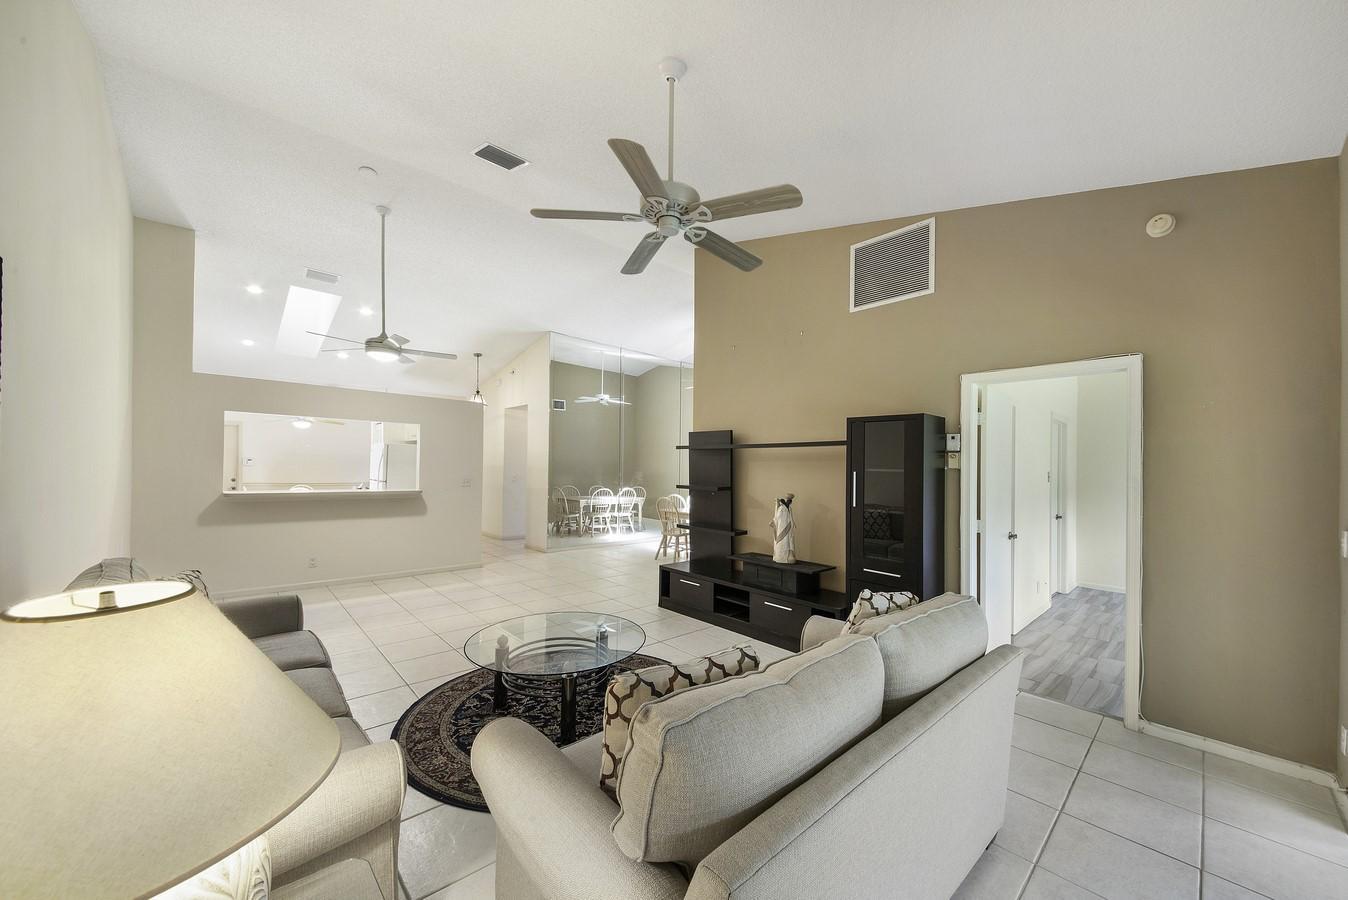 9747 Pavarotti Terrace 103 Boynton Beach, FL 33437 photo 5